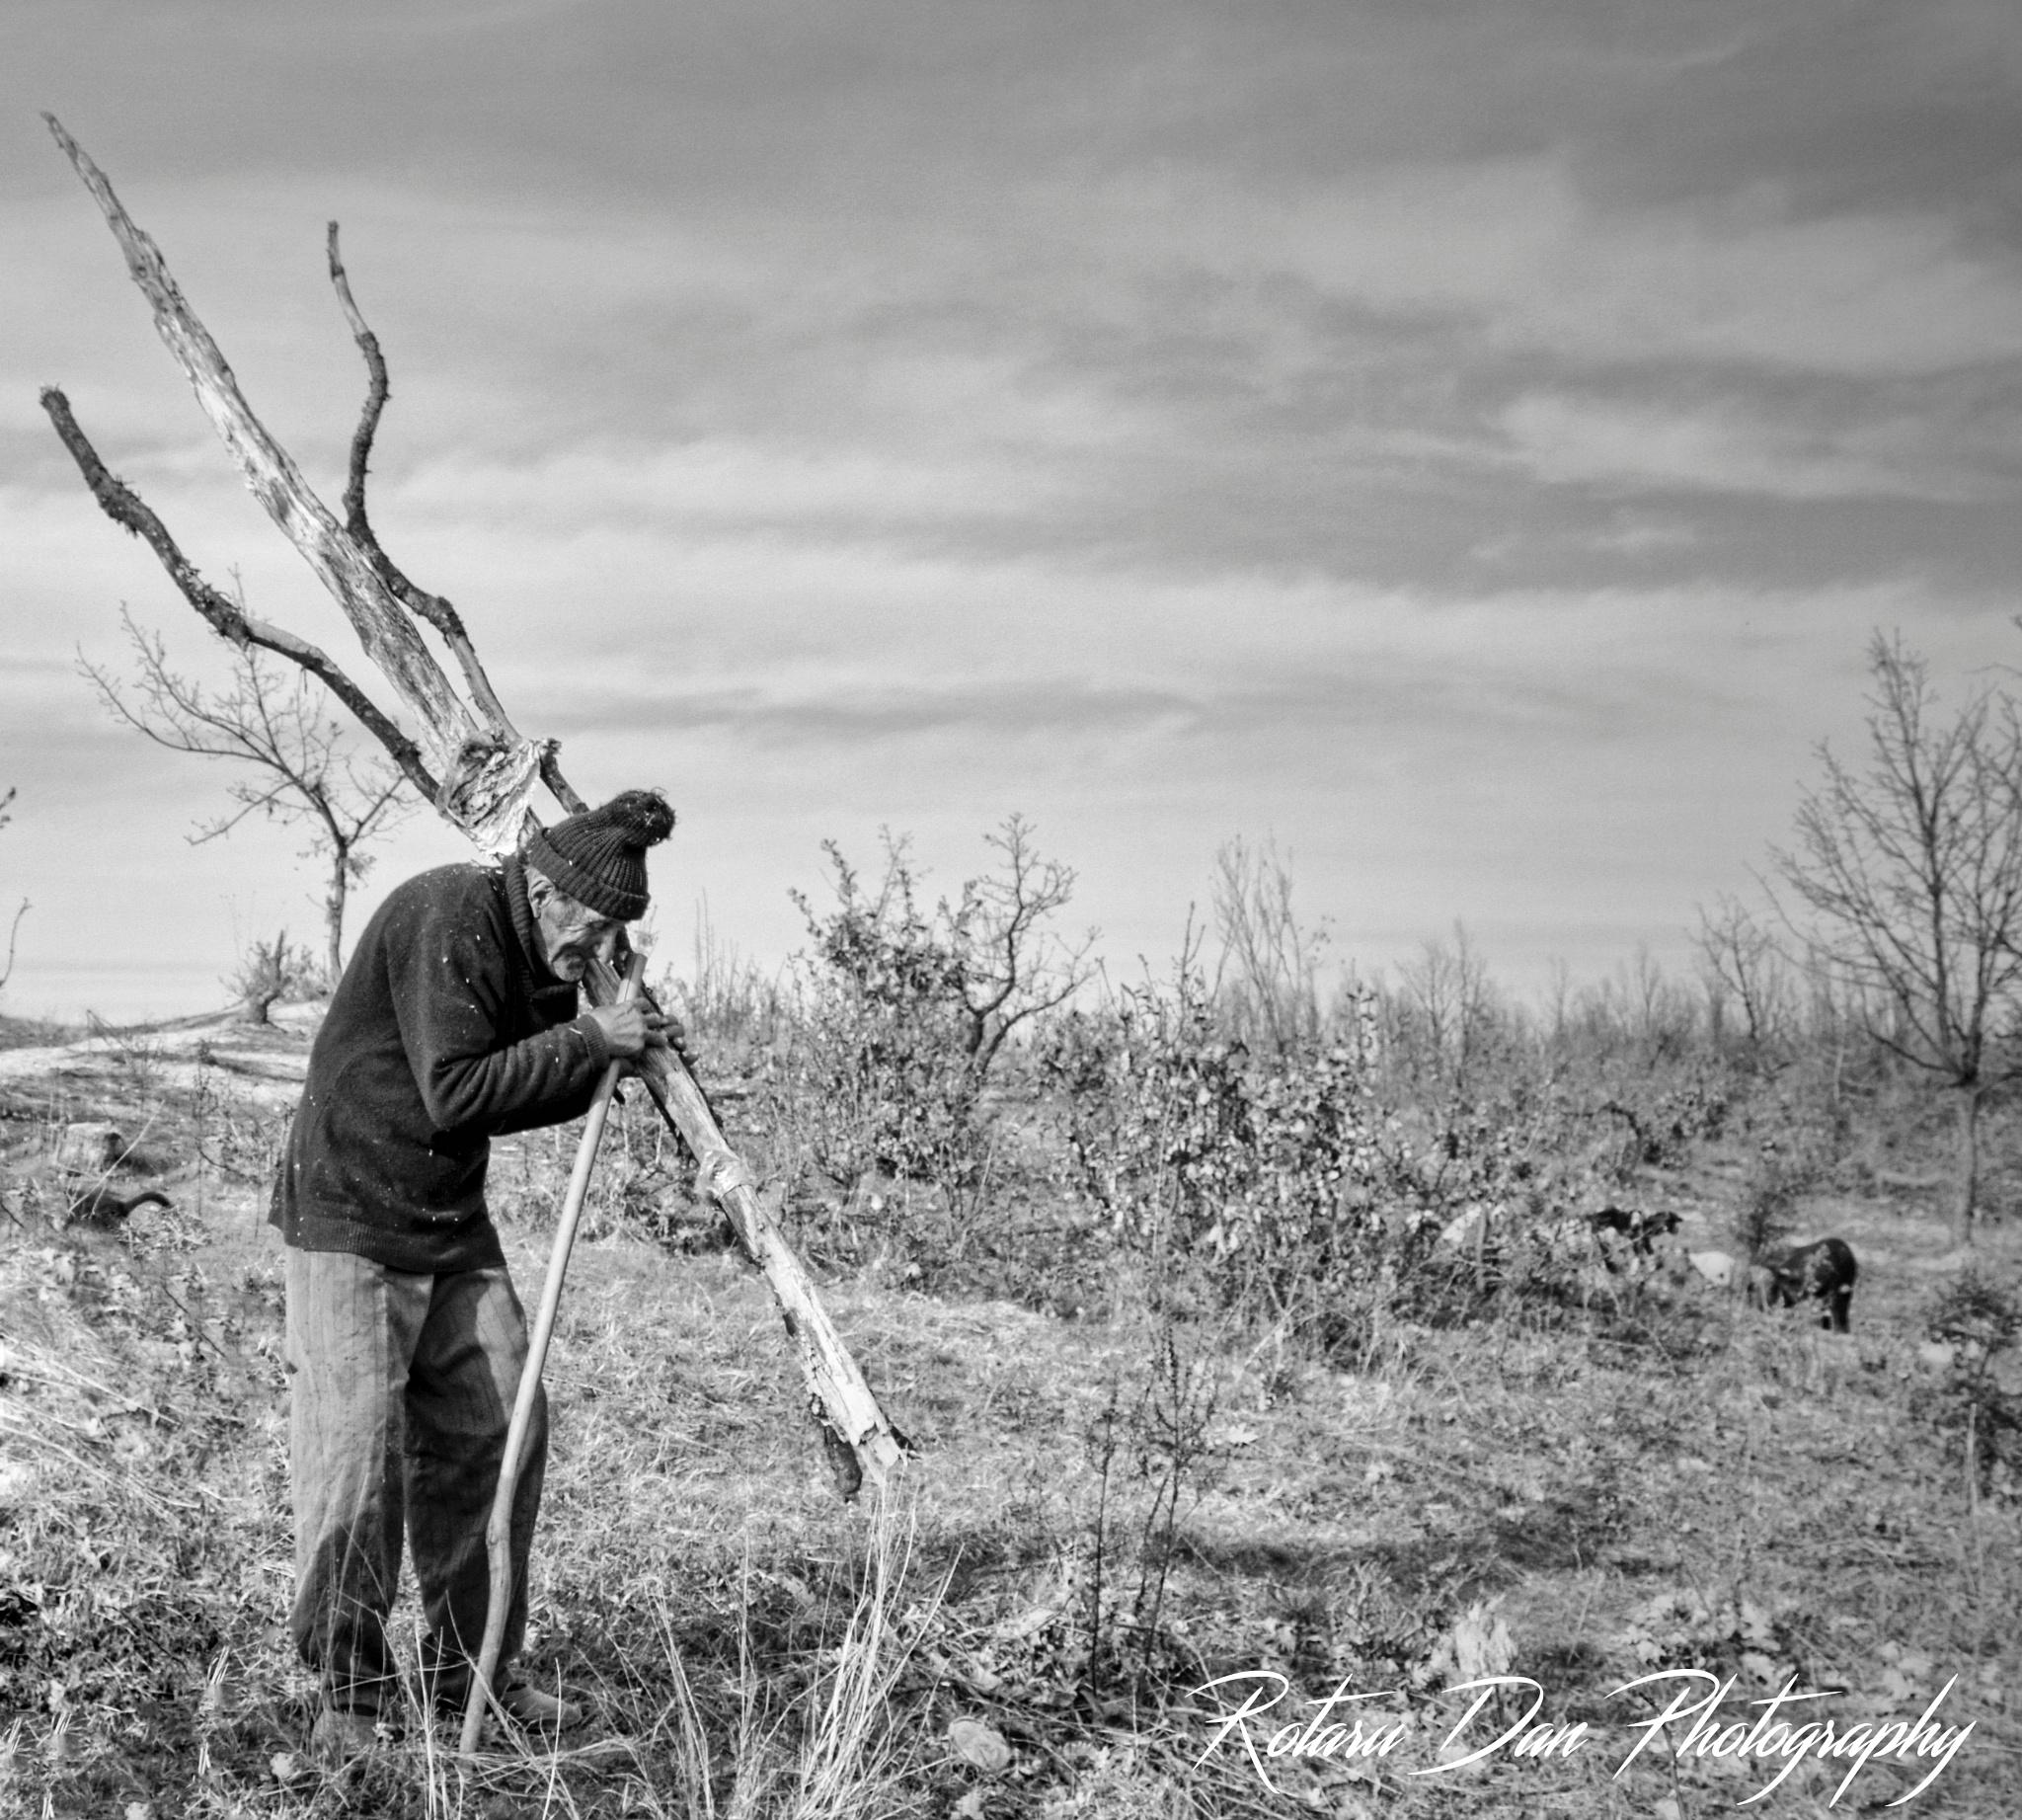 Old man, work hard by Rotaru Dan